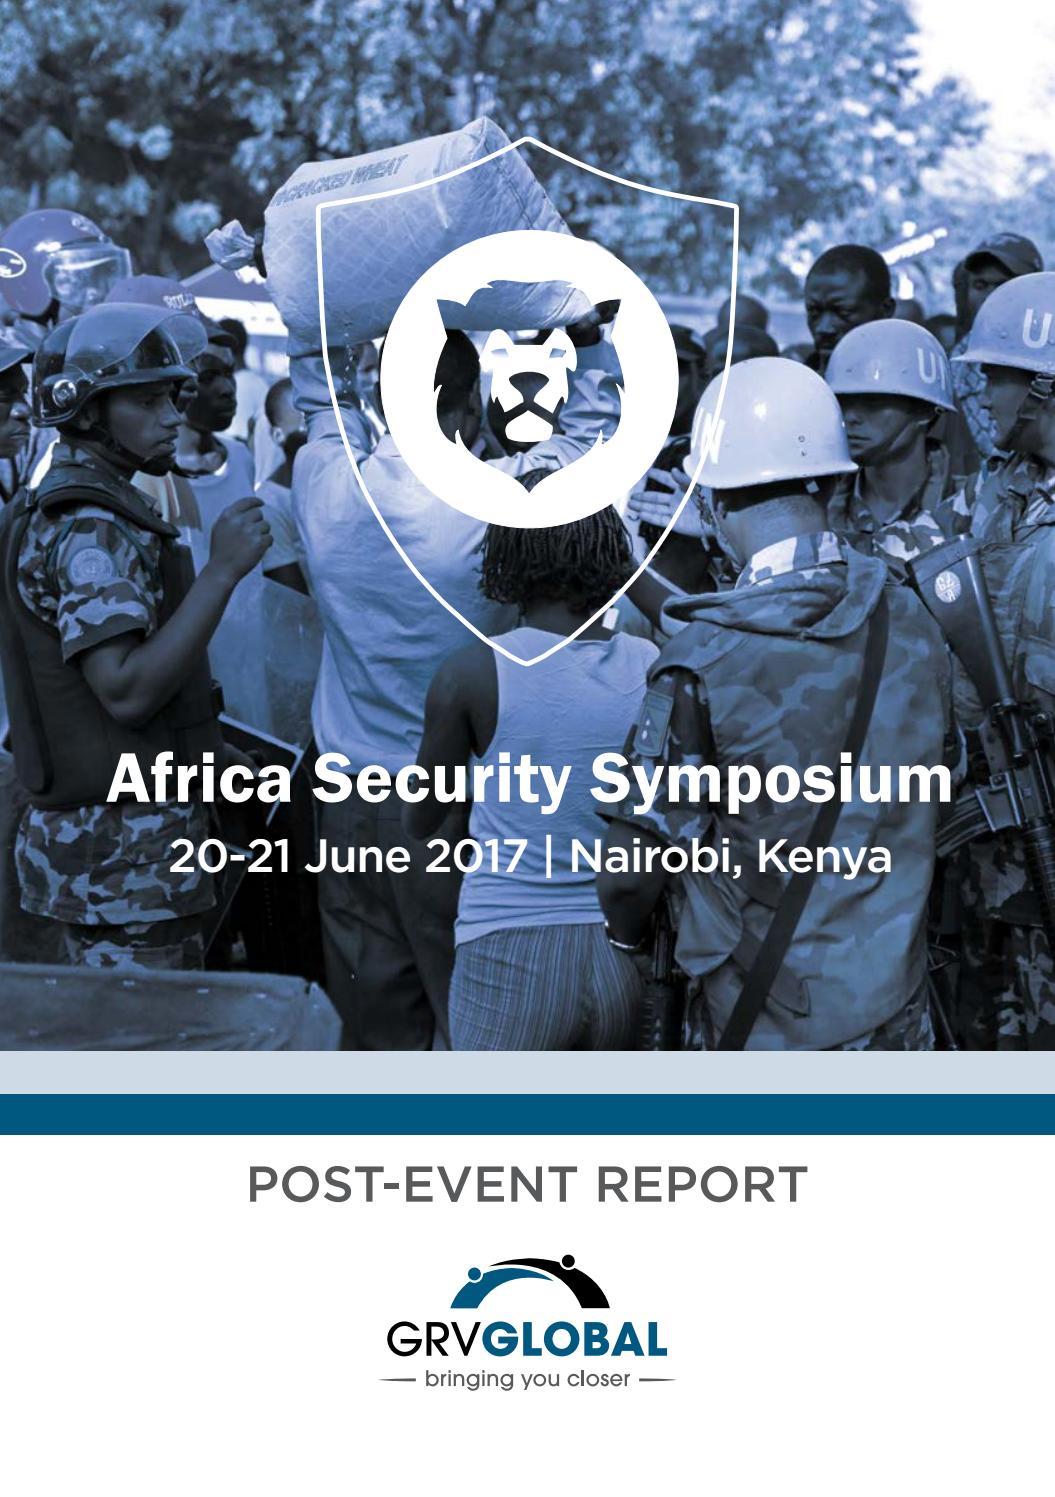 Africa Security Symposium by GRV Global - issuu